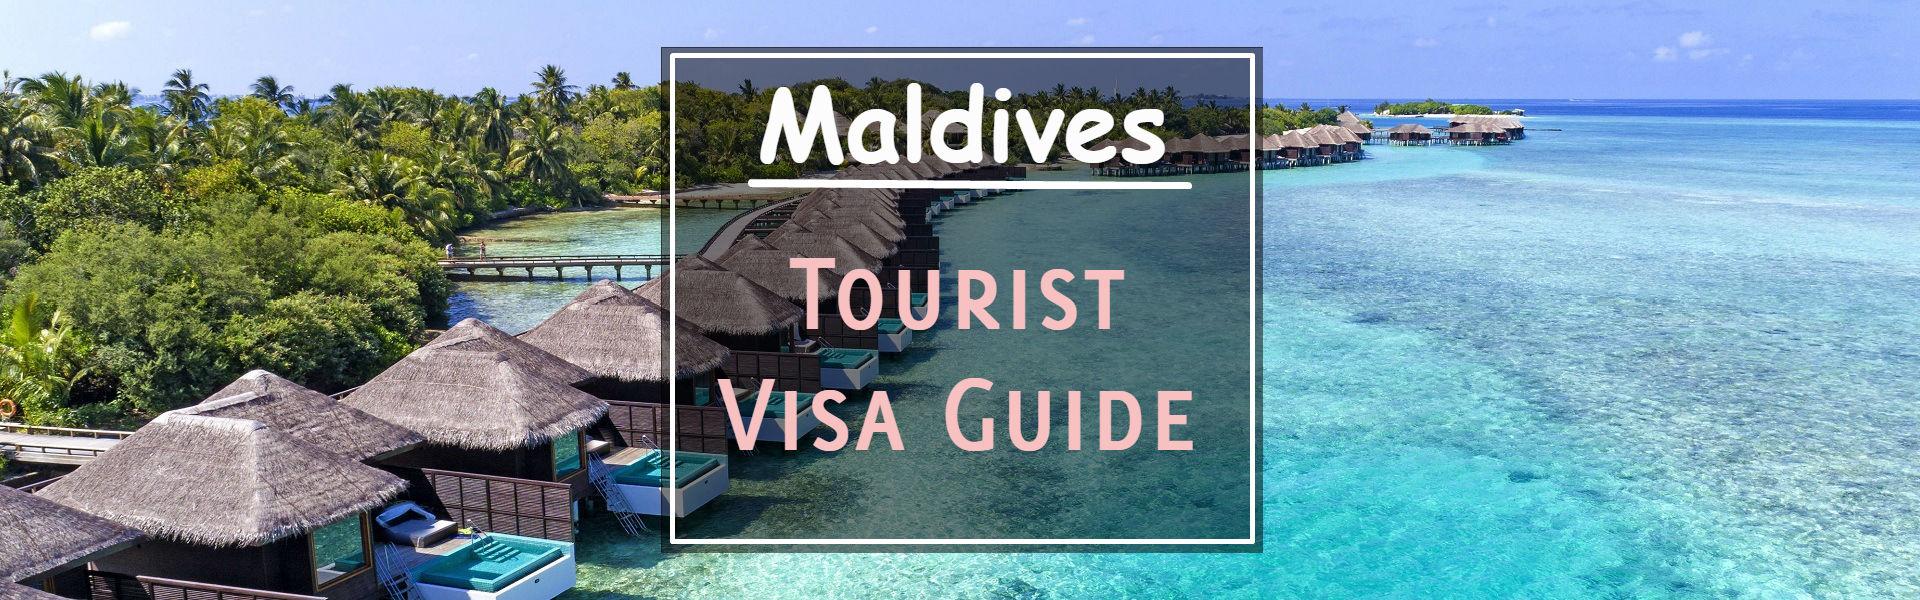 Maldives Visa Guide